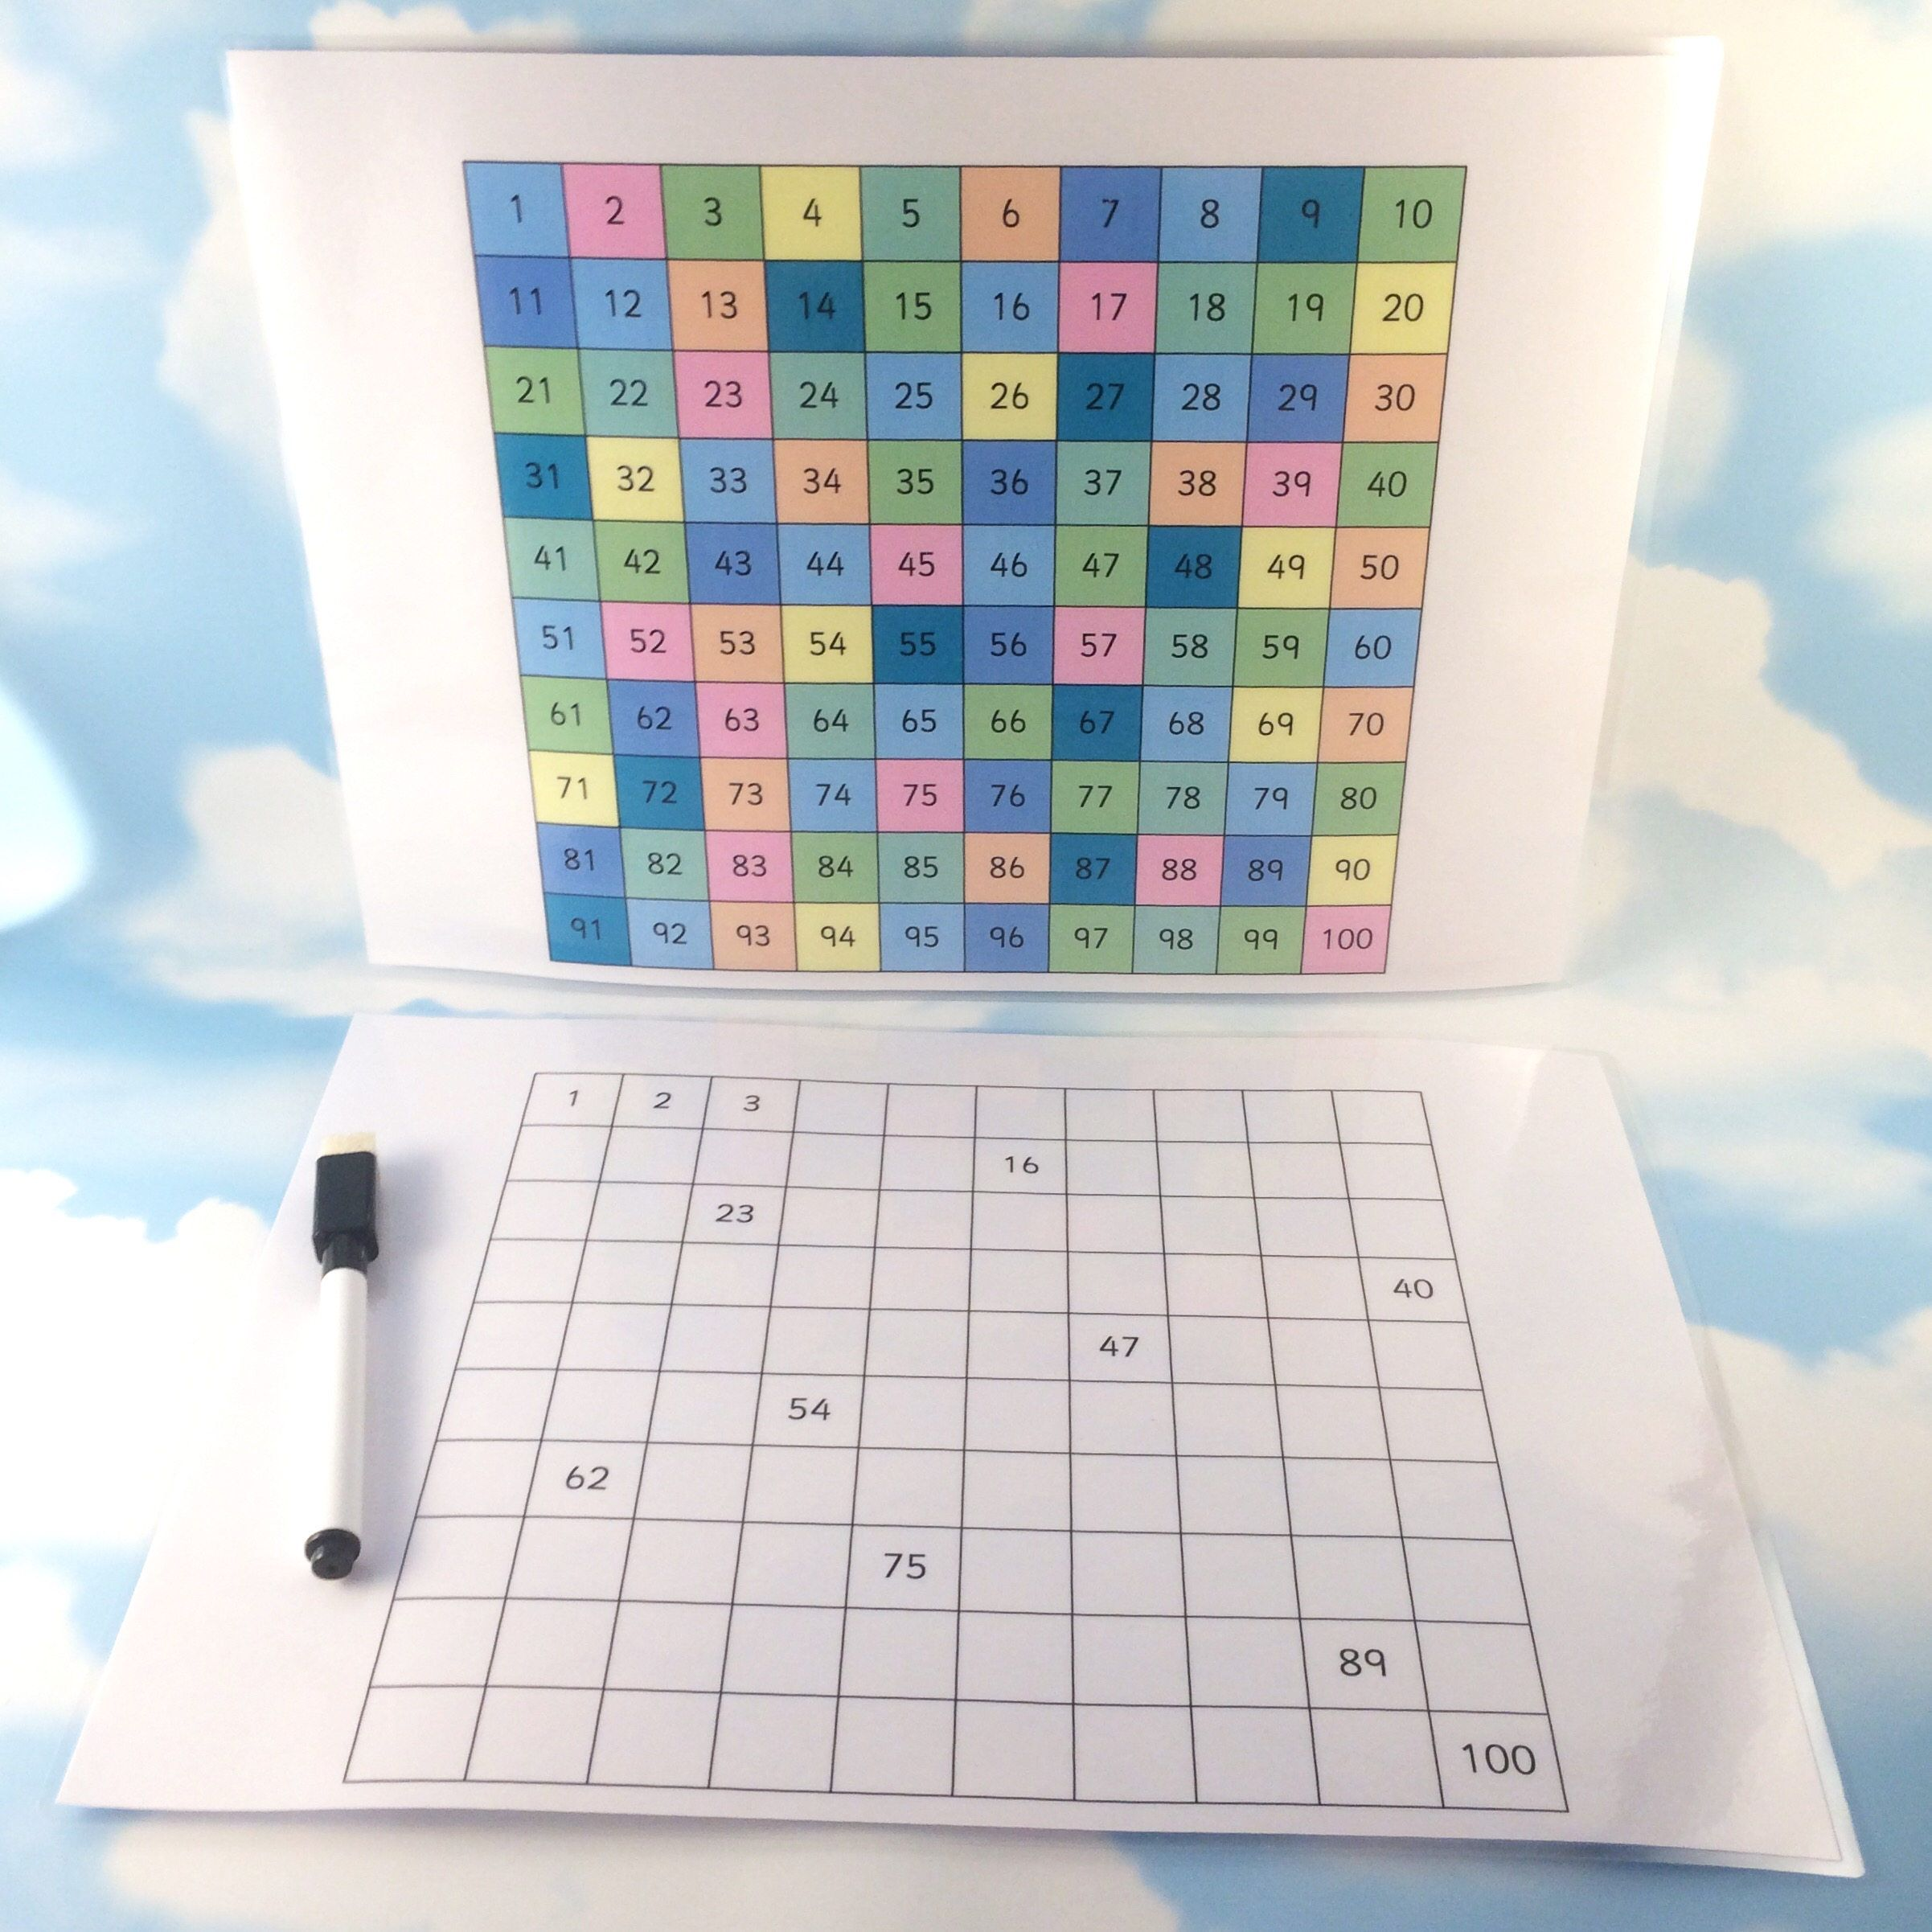 30 Worksheets Coloring A Grid 2 Cleteandjennysclan